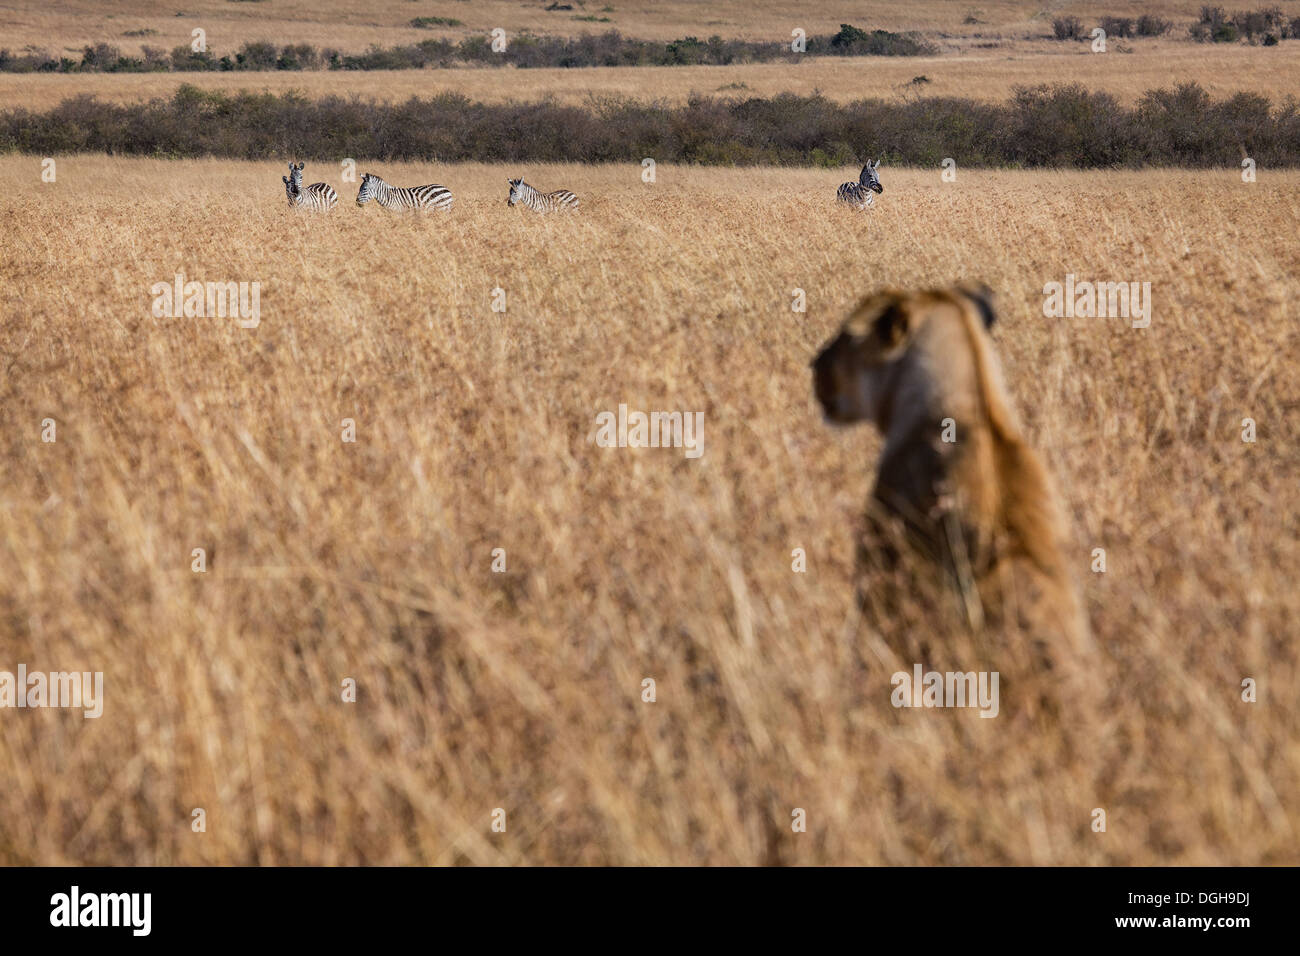 lioness watching zebras in the Masai Mara - Stock Image